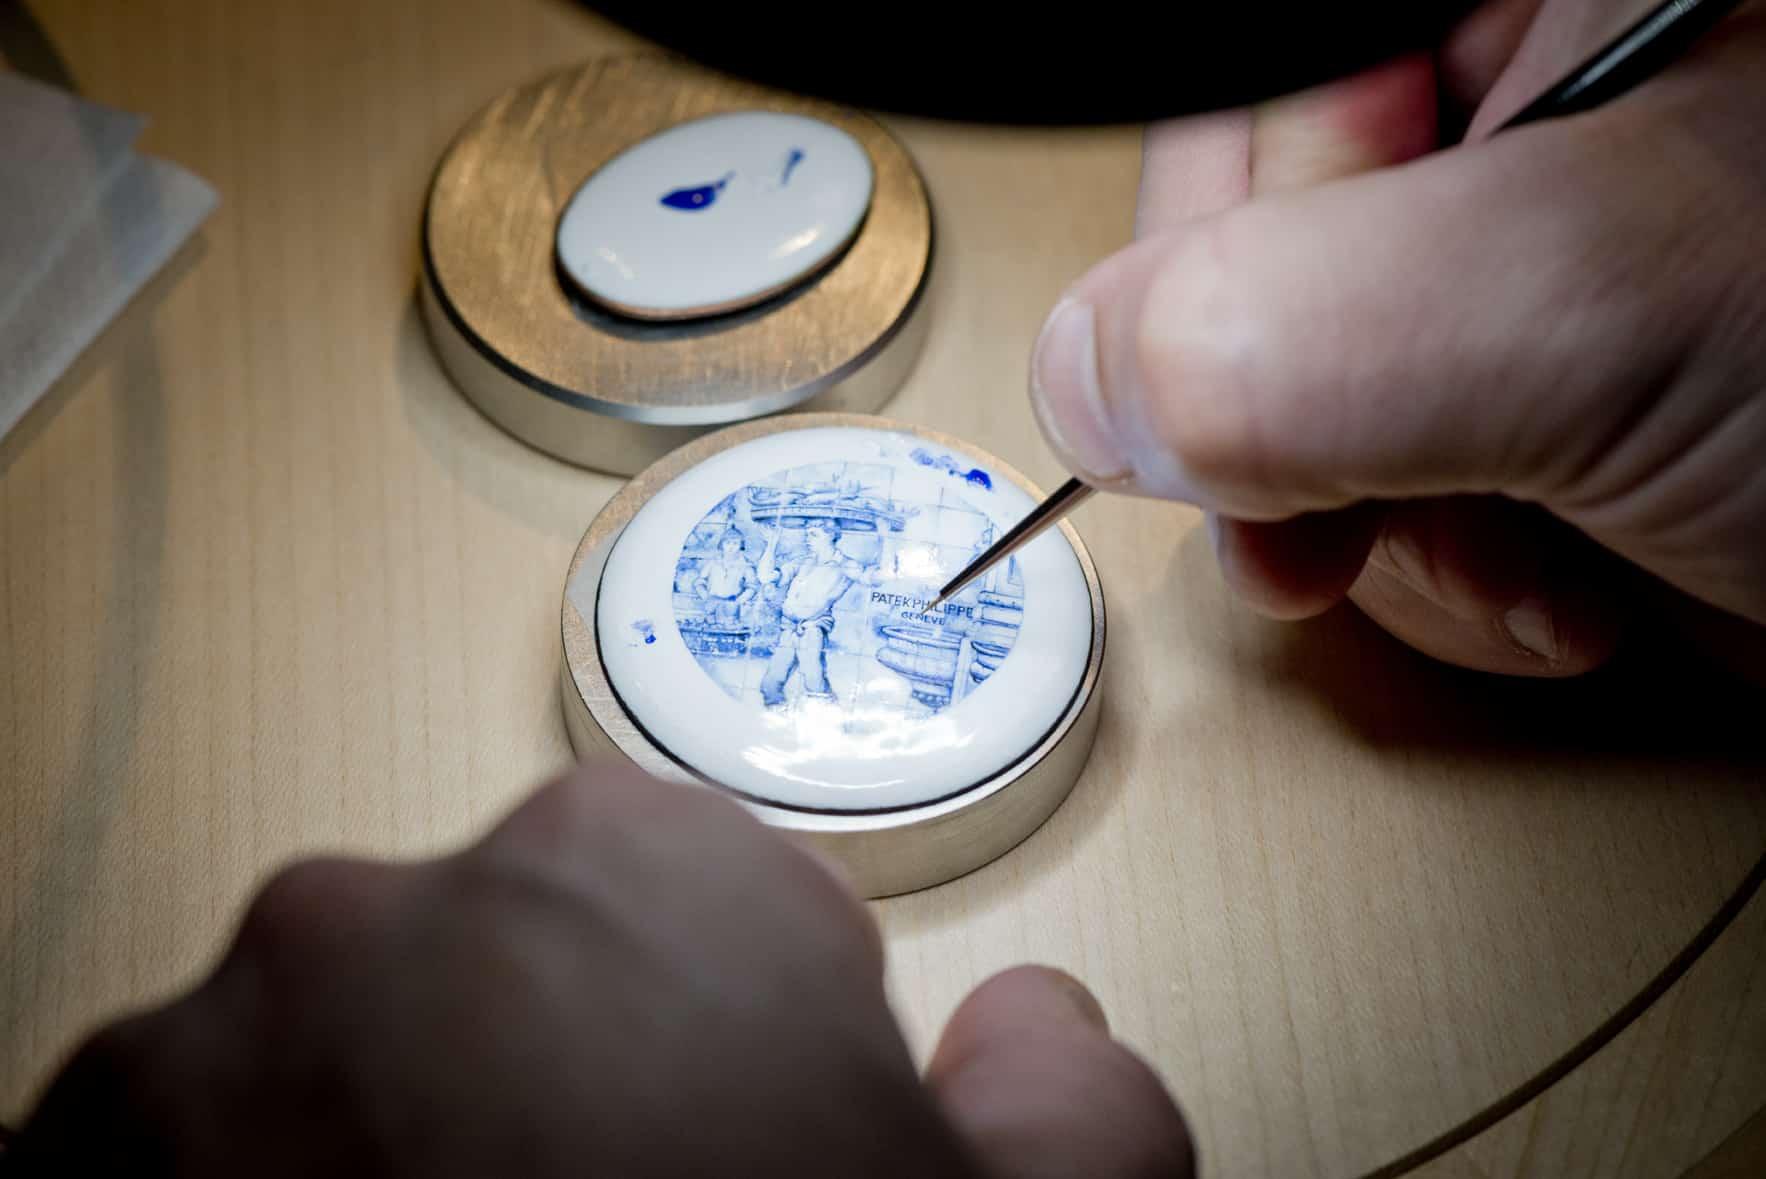 Patek Philippe Rare Handcrafts 2018 Zifferblatt Email Miniatur 01